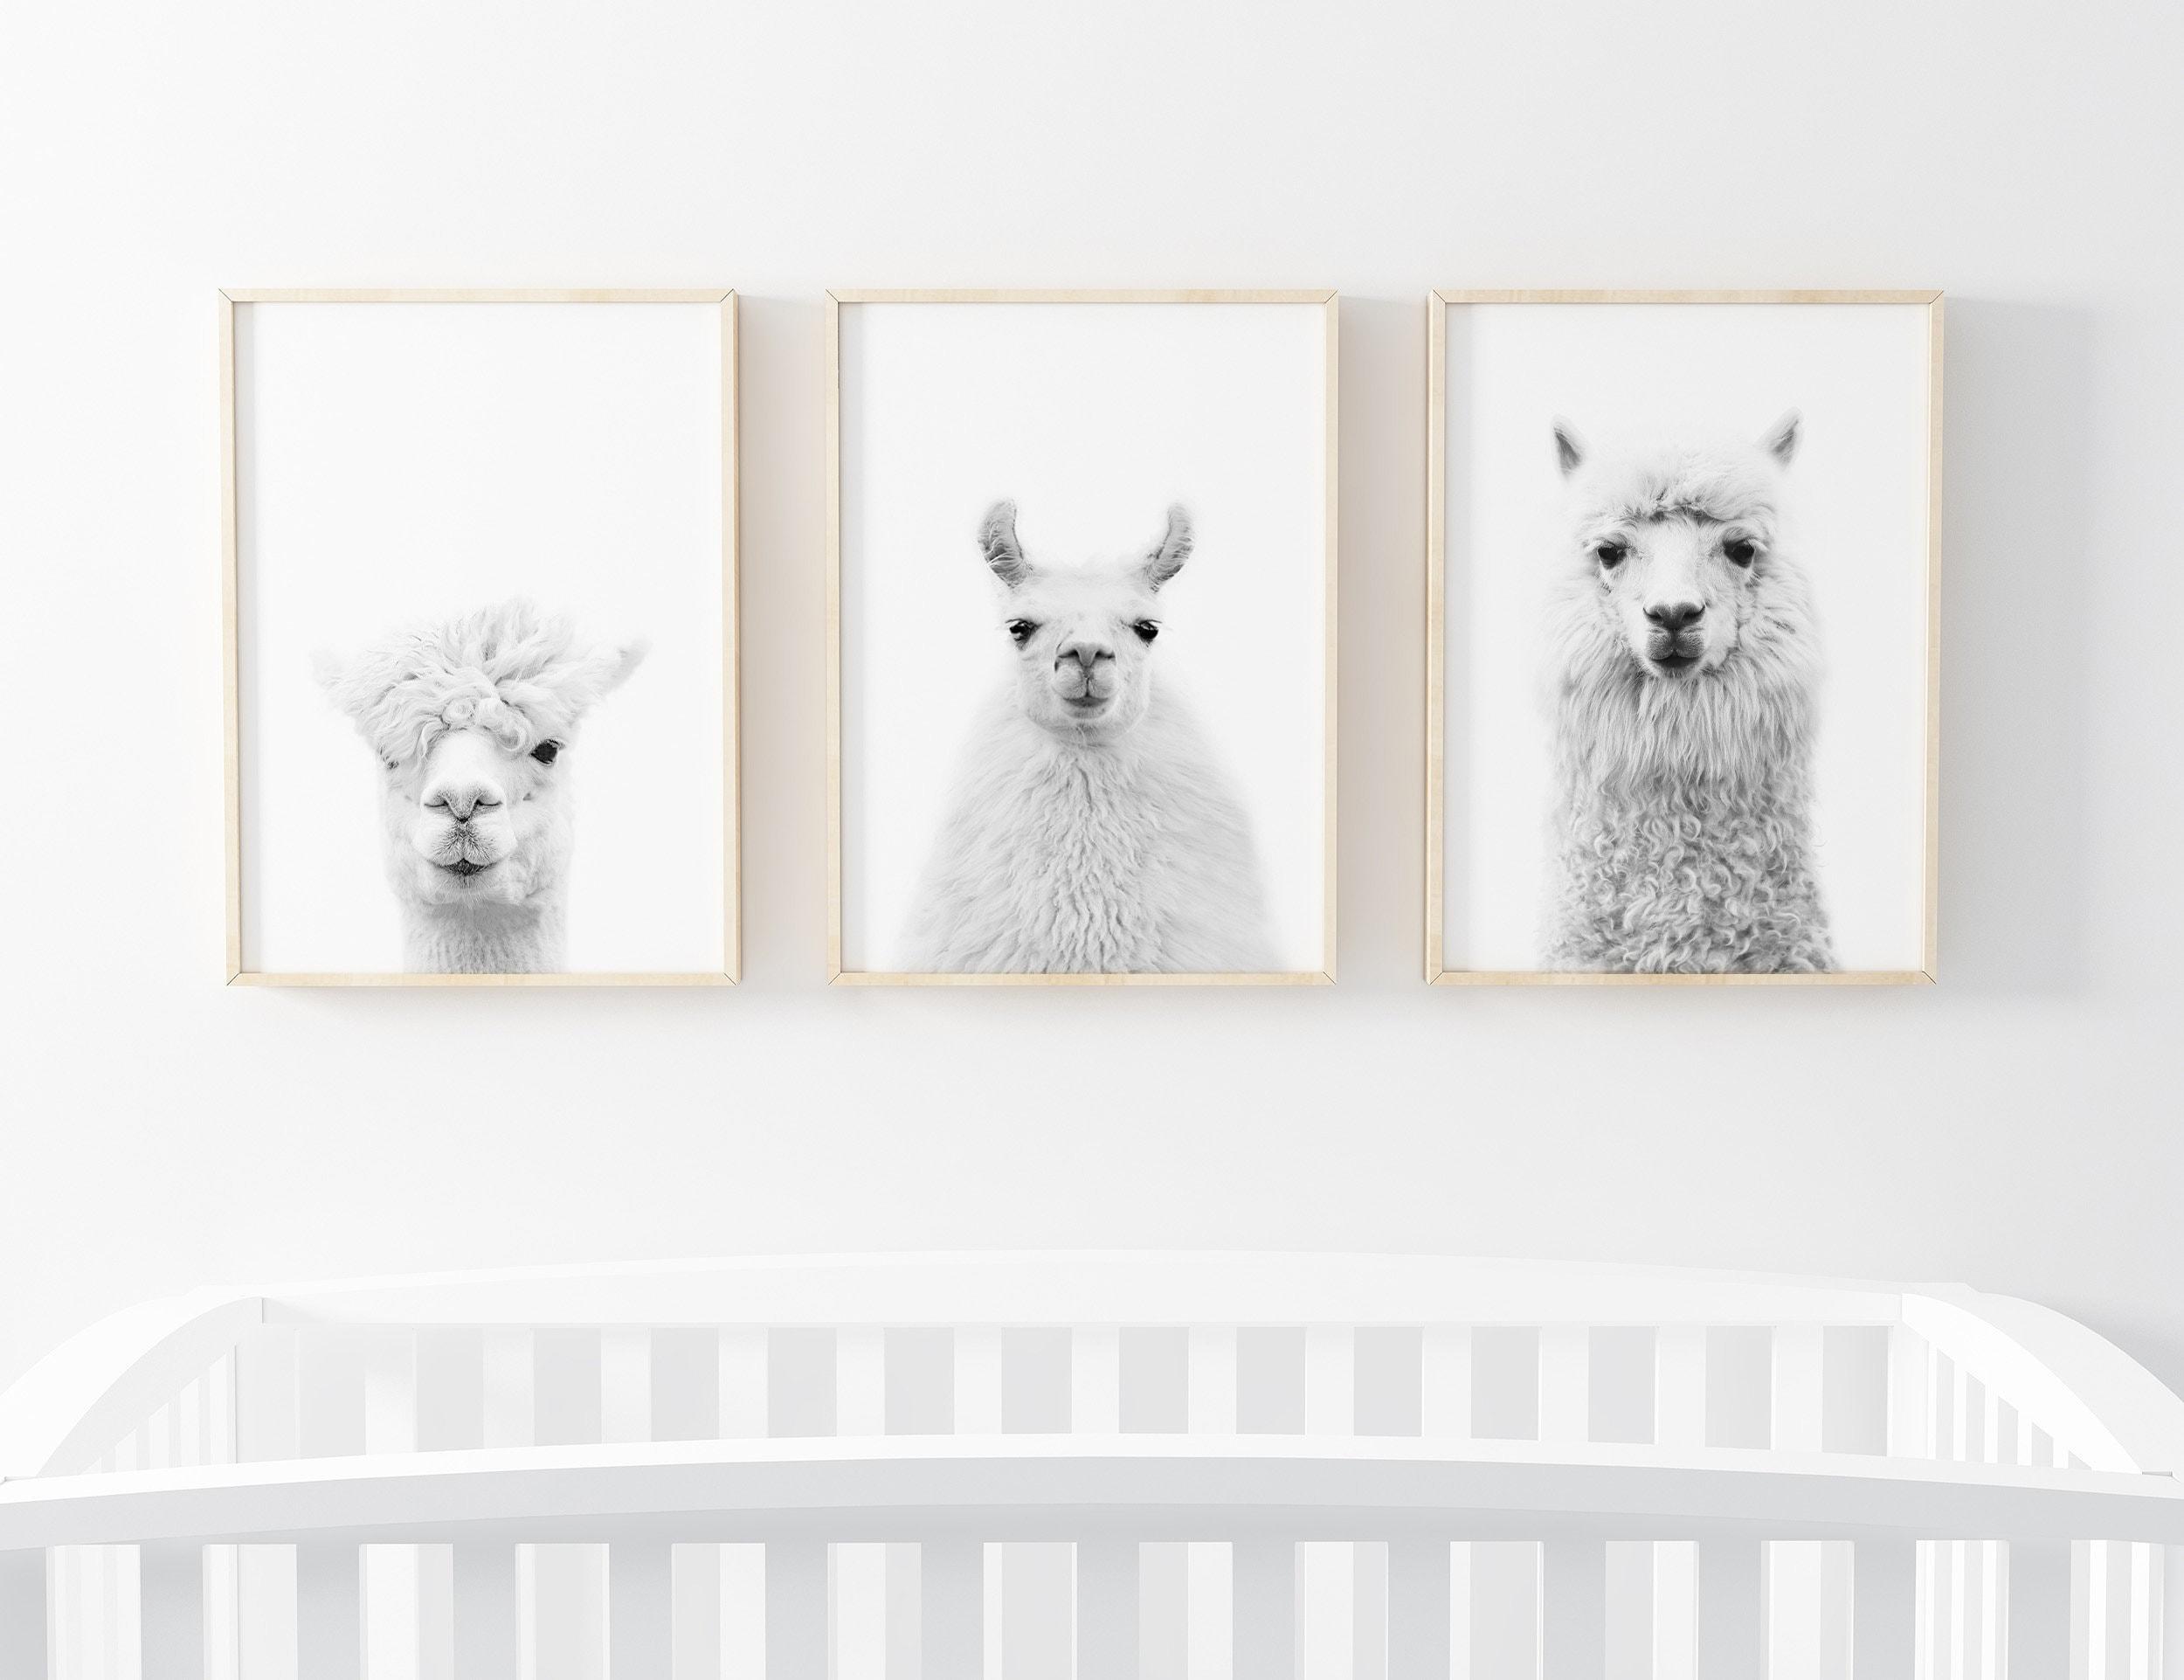 different sizes brown farm animal prints nursery decor Llama printable poster photography kids room home decor wall art gift digital